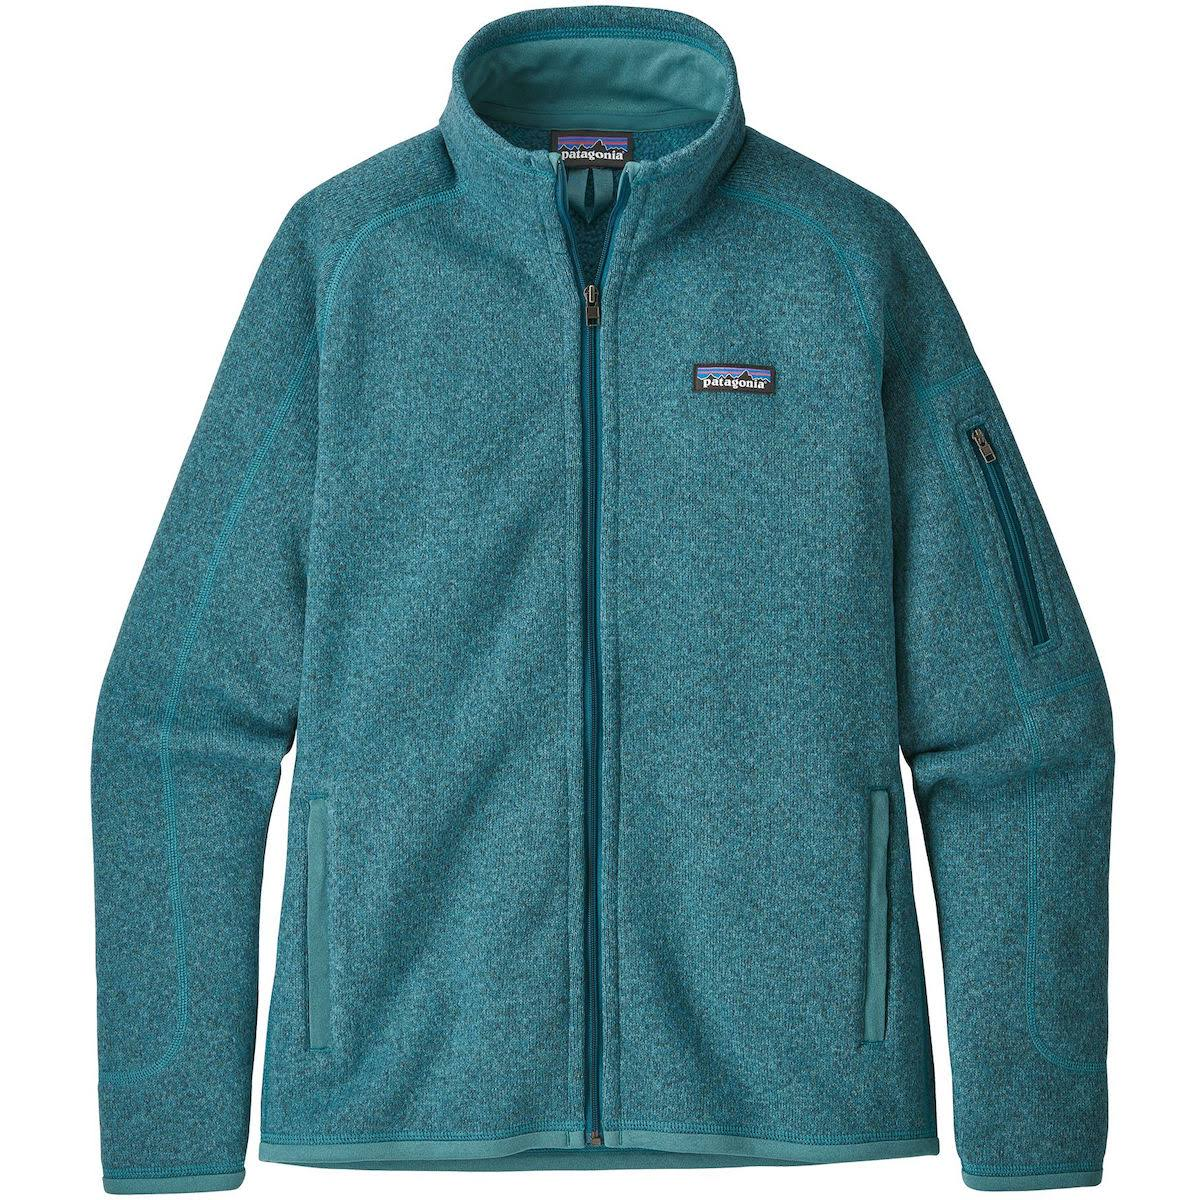 Mujer Better Tasmania Para Jacket Sweater Patagonia De Trullo 10YqXwAd